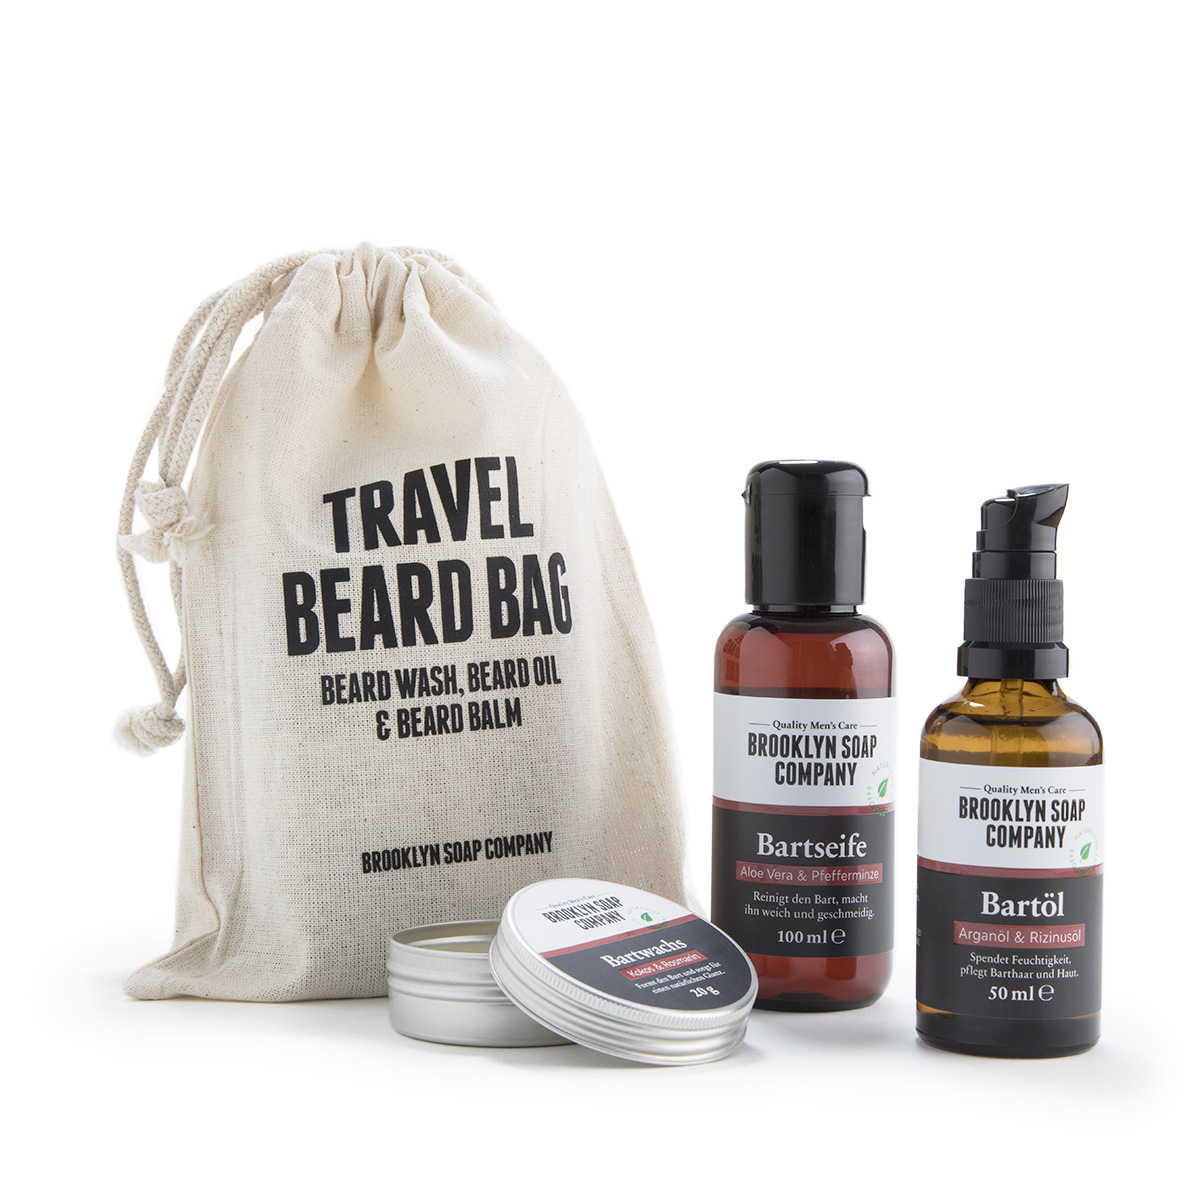 Beard Bag Travel